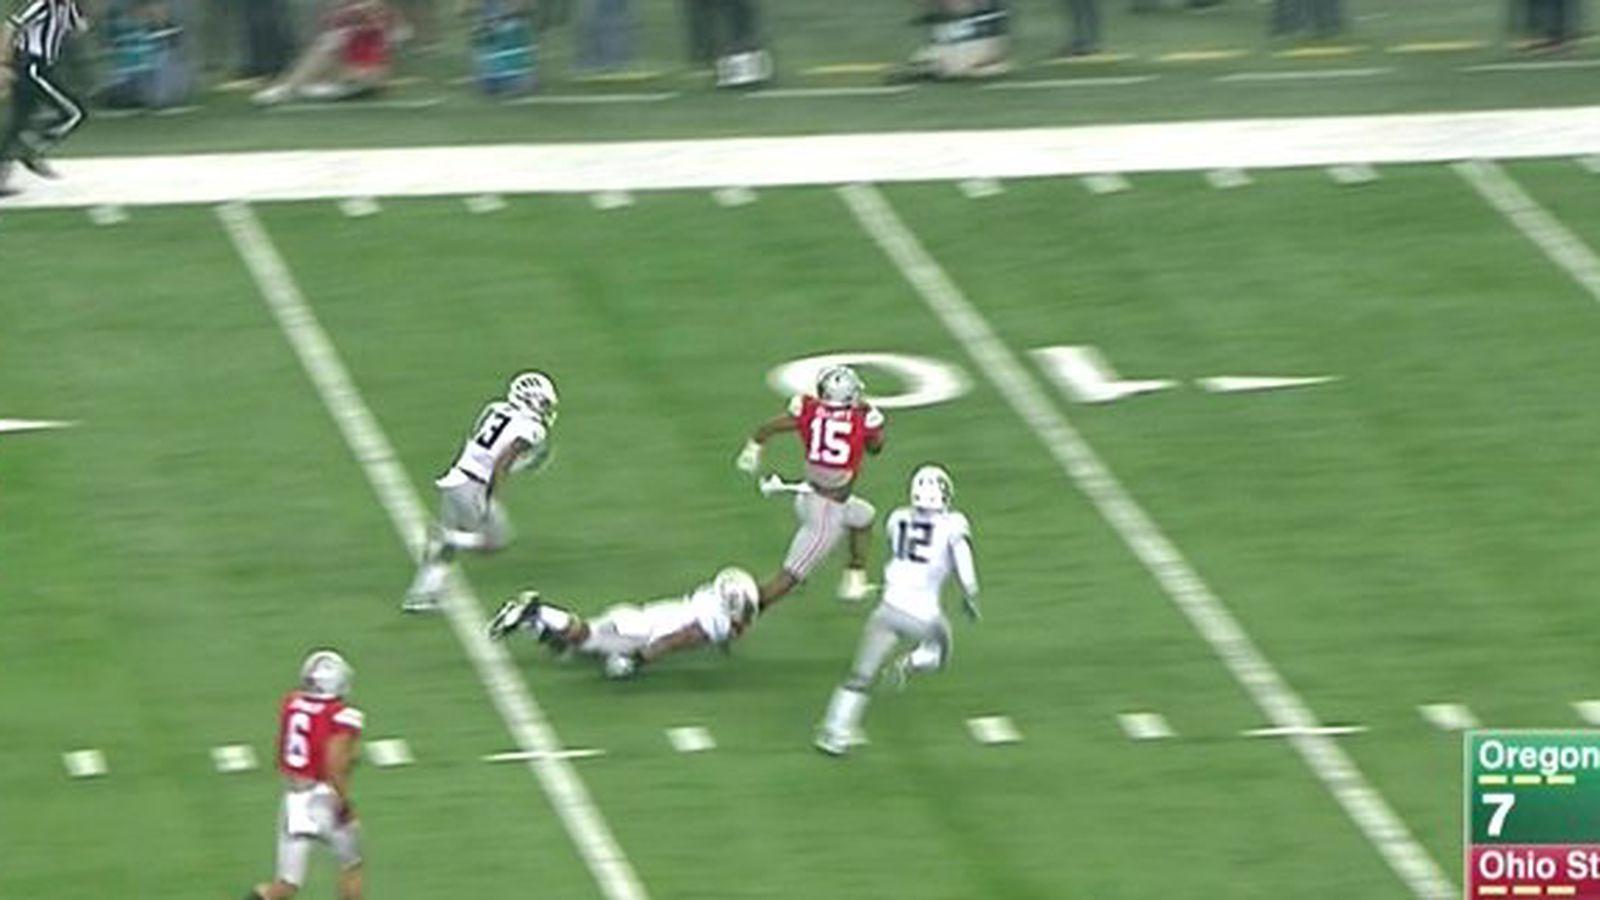 Ezekiel Elliott Ohio State Beat Oregon To Win National - Ohio state ties oregon 7 7 on ezekiel elliott touchdown run